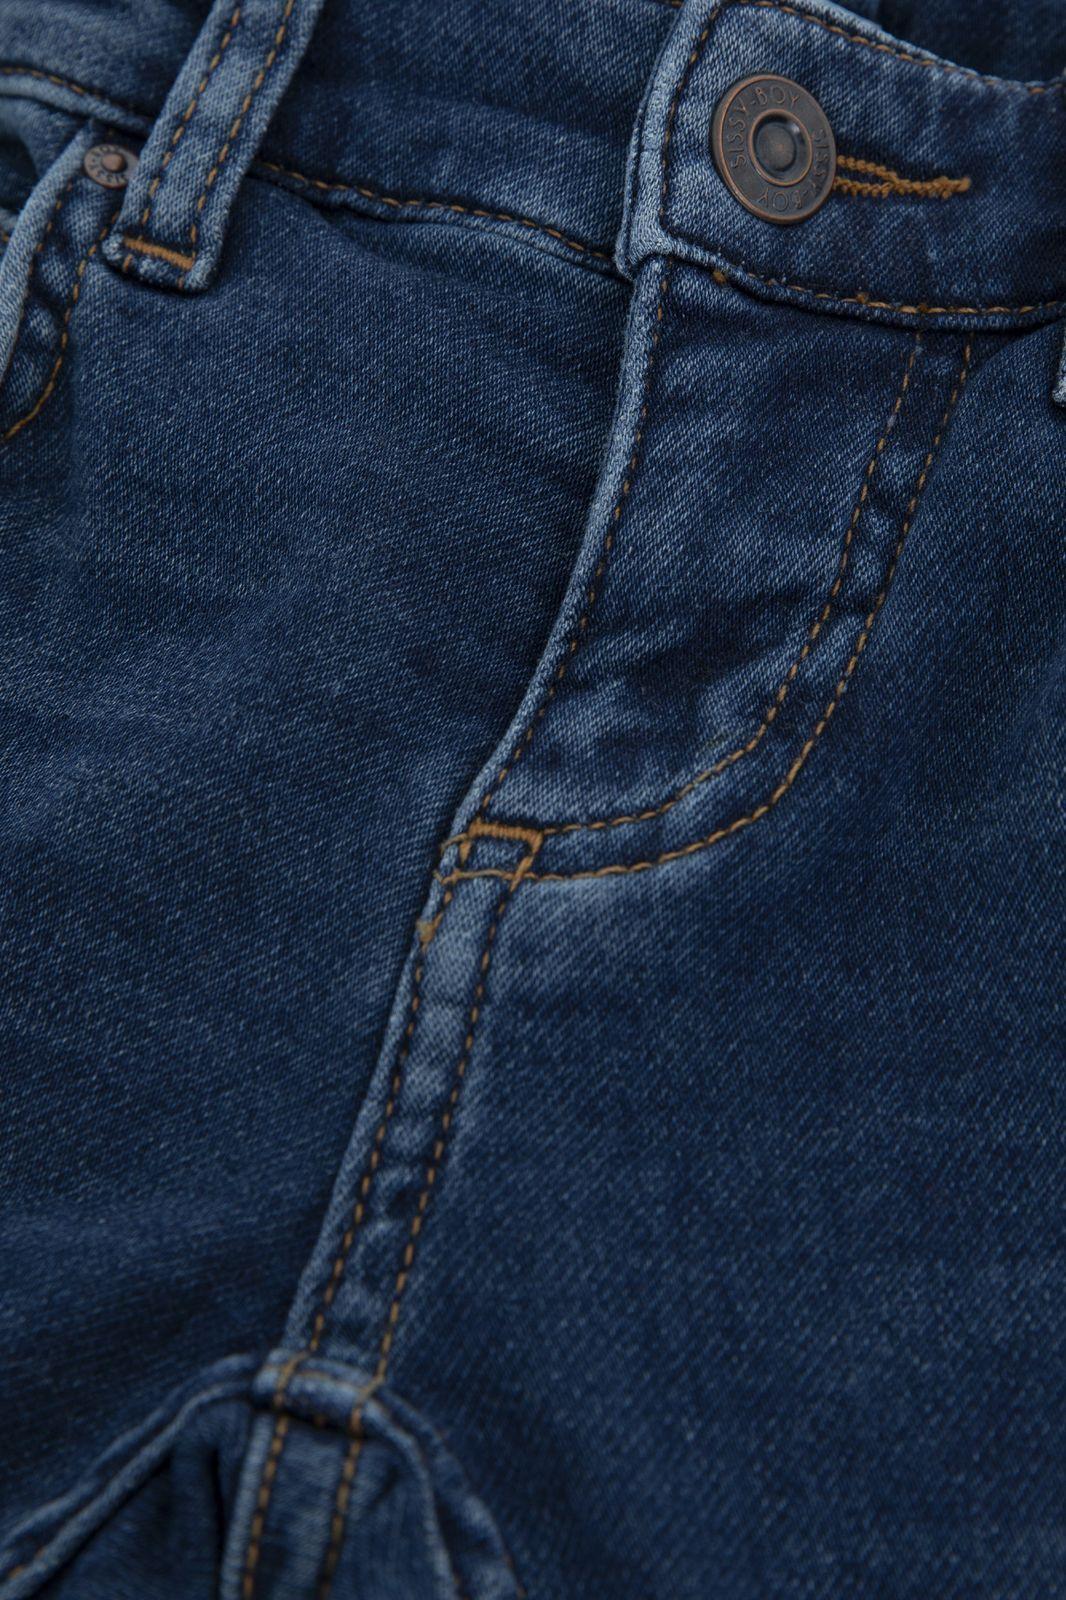 Blauwe jog jeans